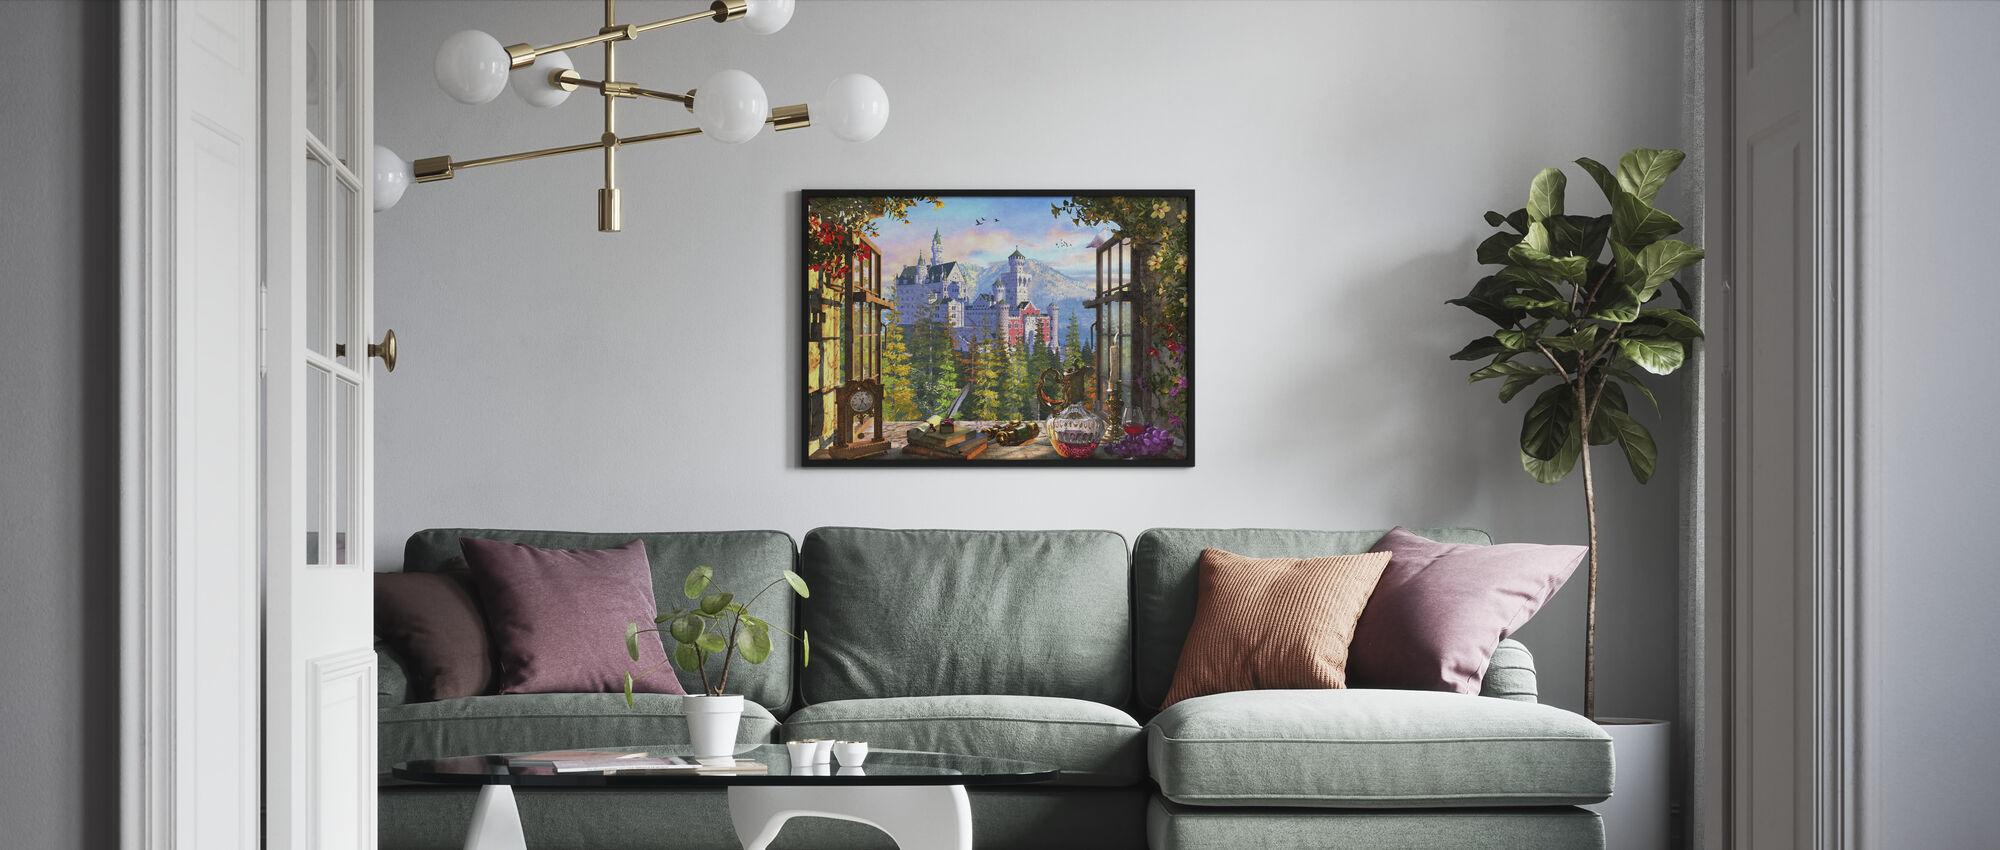 Mountain Castle through Window - Framed print - Living Room